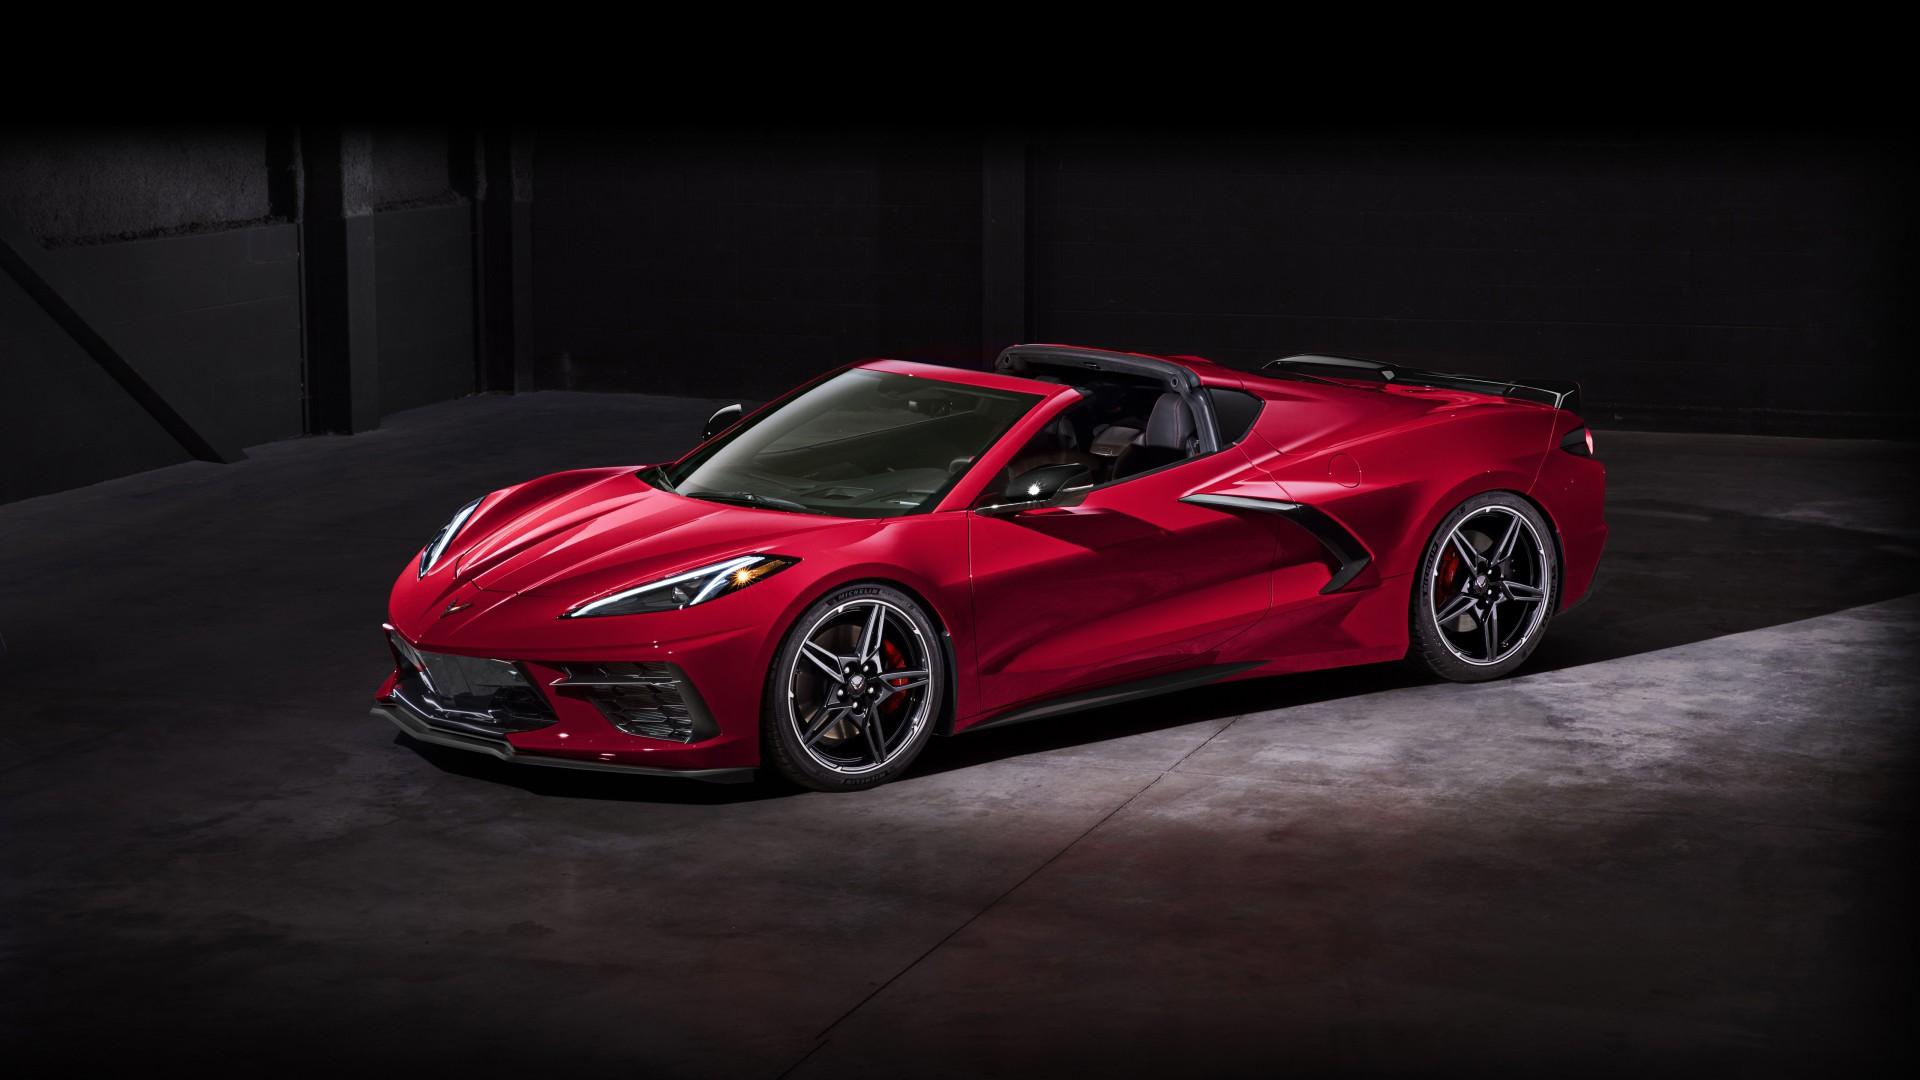 2020 Chevrolet Corvette Stingray Z51 Convertible 4K ...